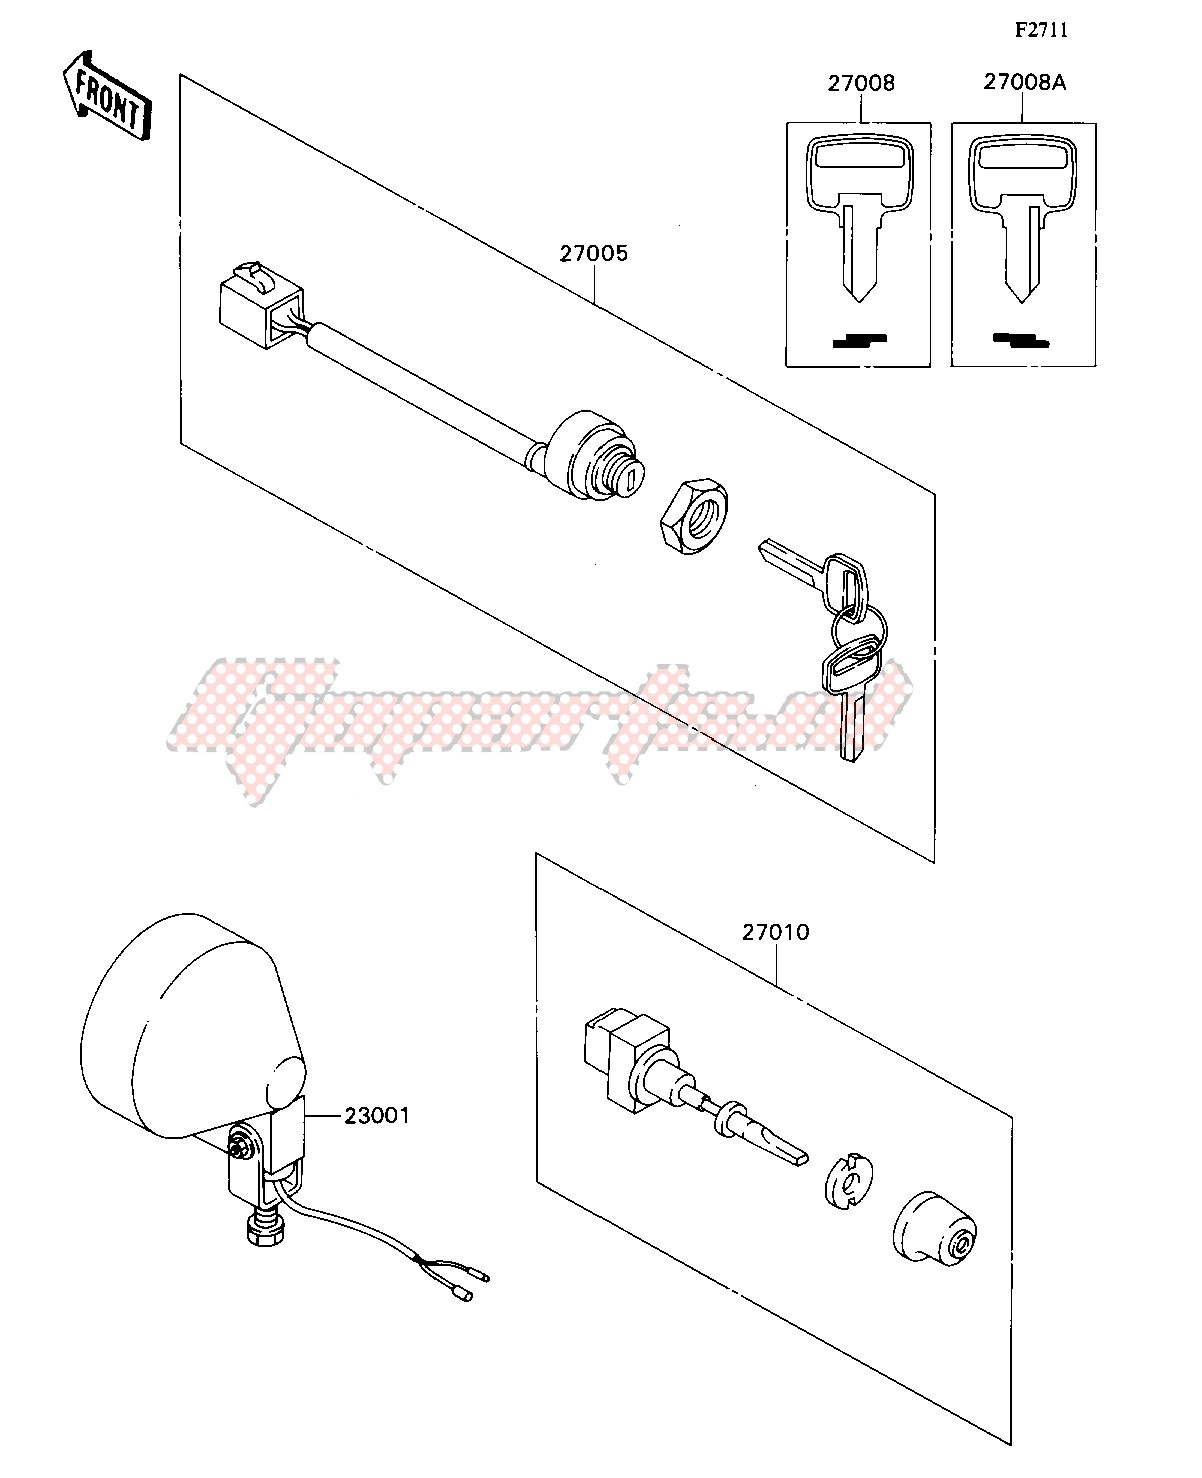 HEAD LAMP_IGNITION image